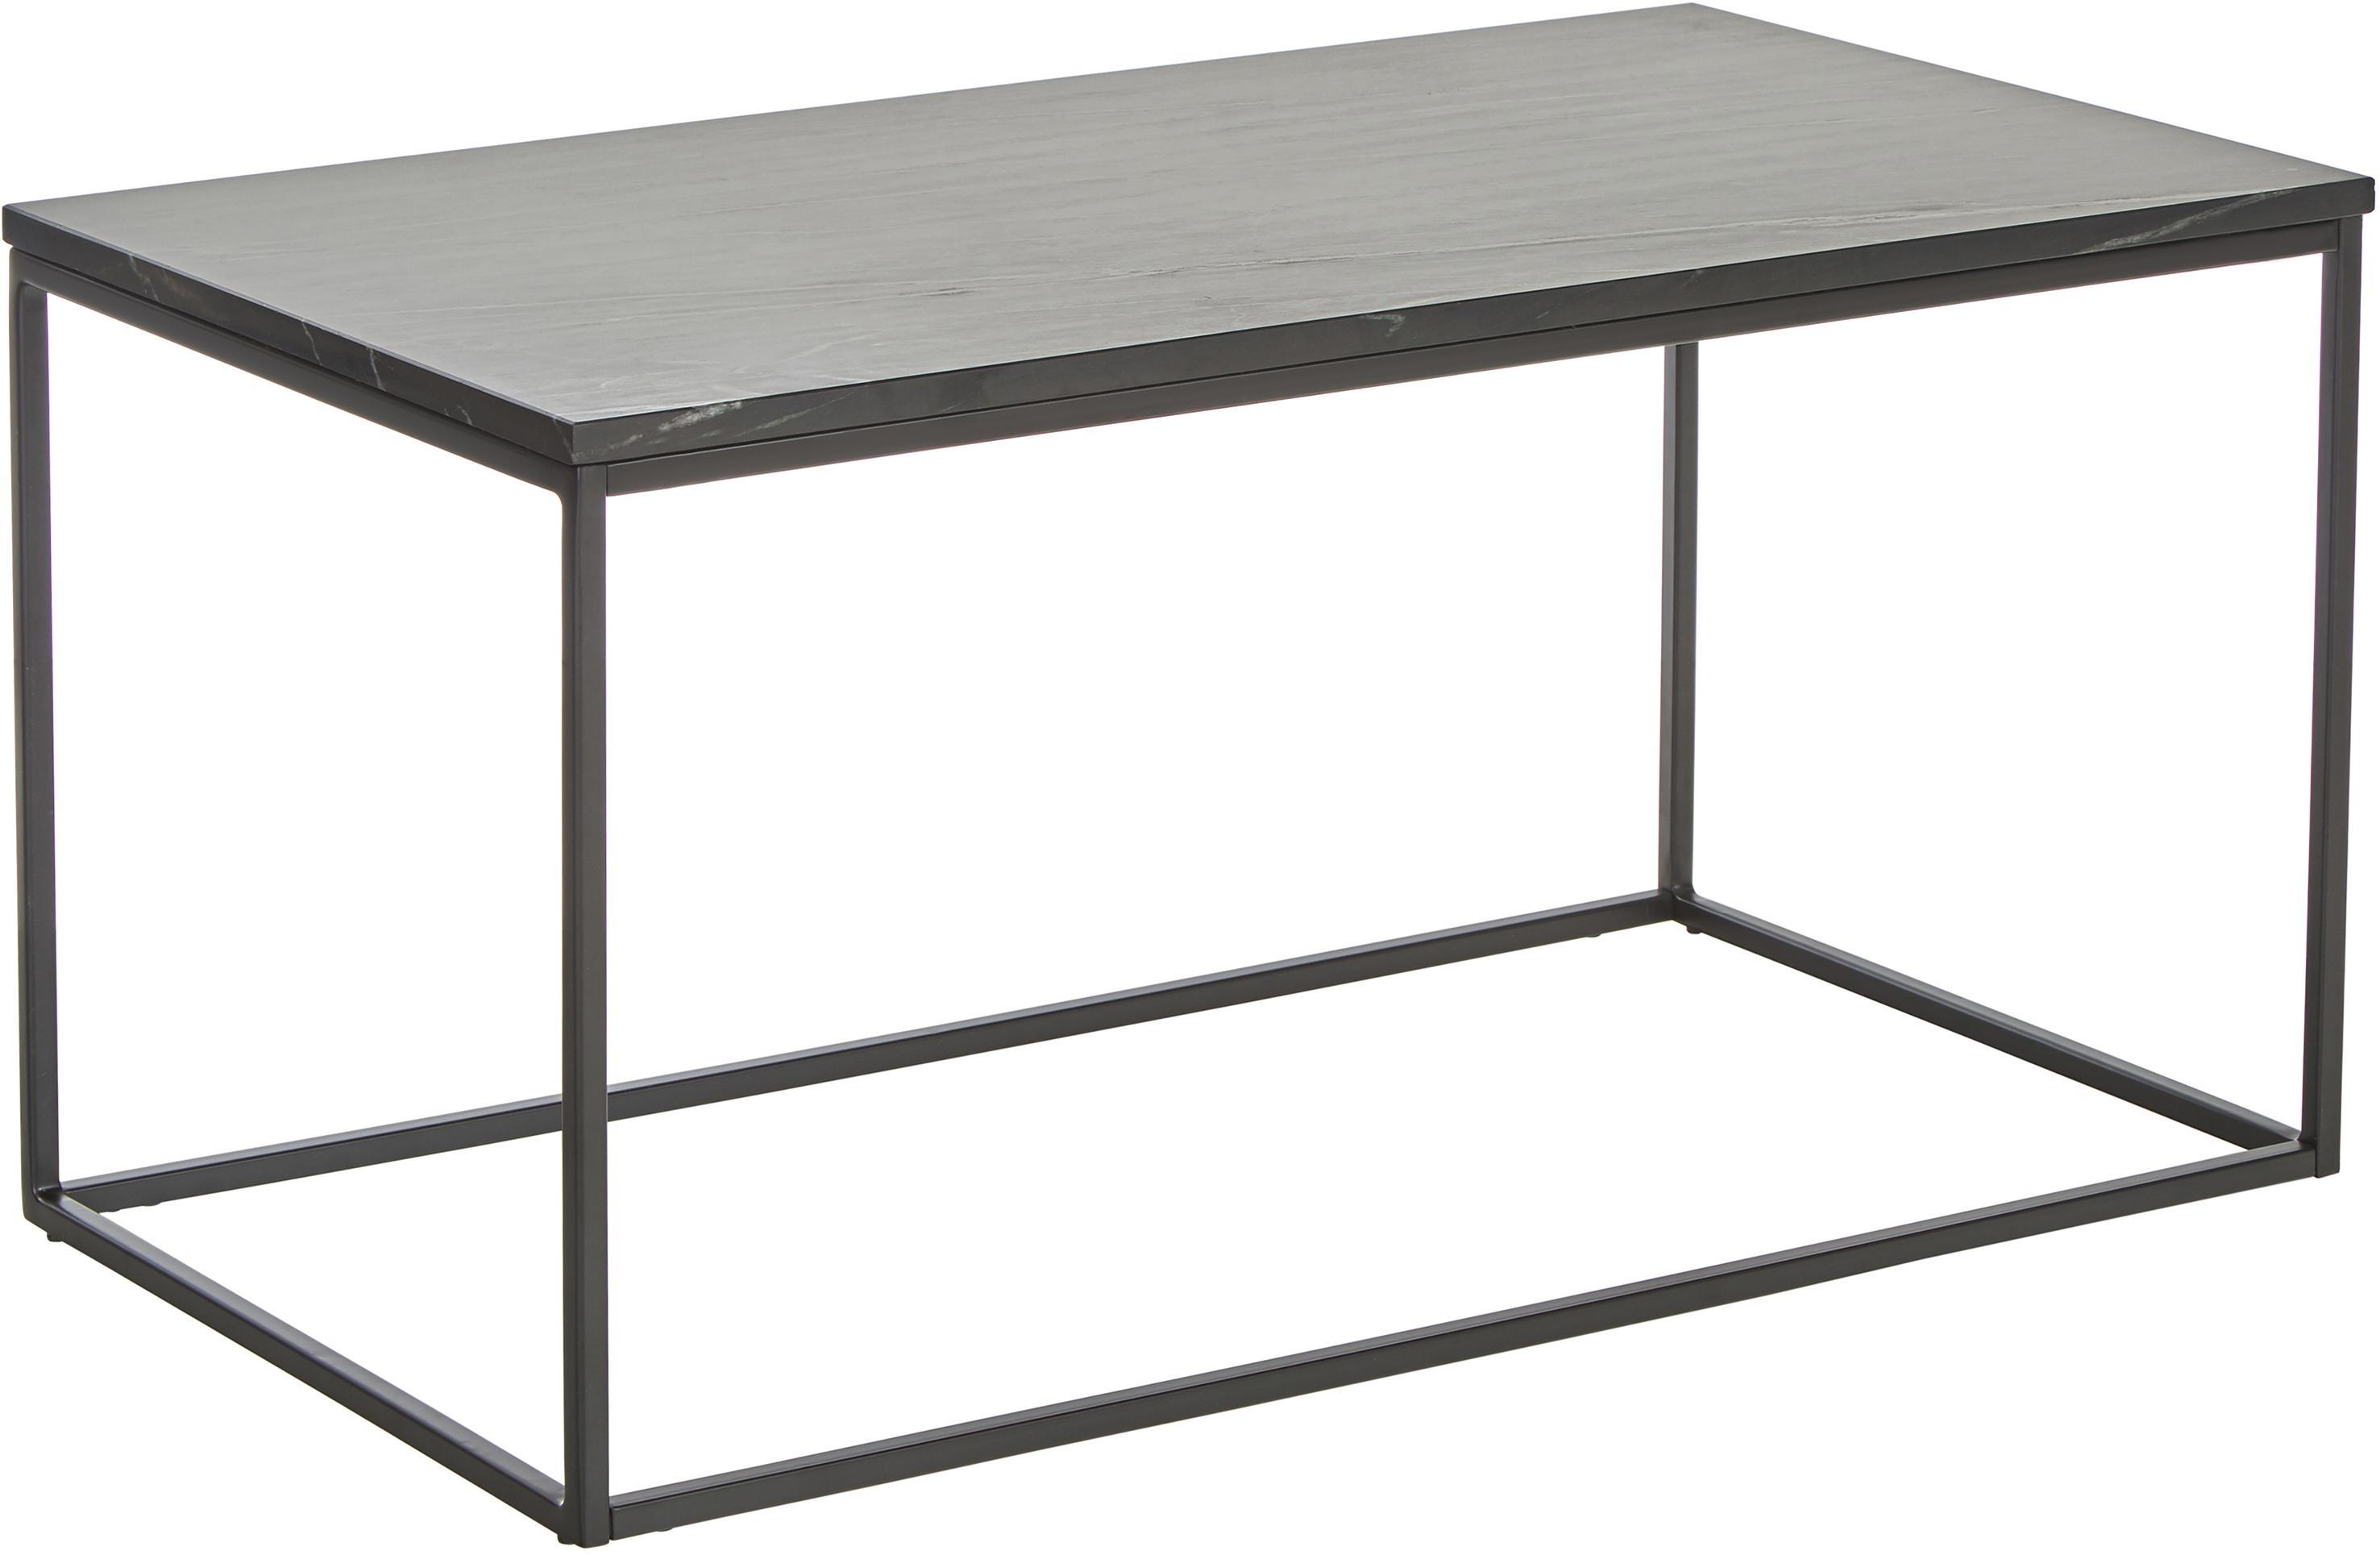 Marmeren salontafel Alys, Tafelblad: marmer, Frame: gepoedercoat metaal, Tafelblad: zwart marmer, licht glanzend. Frame: mat zwart, 80 x 45 cm